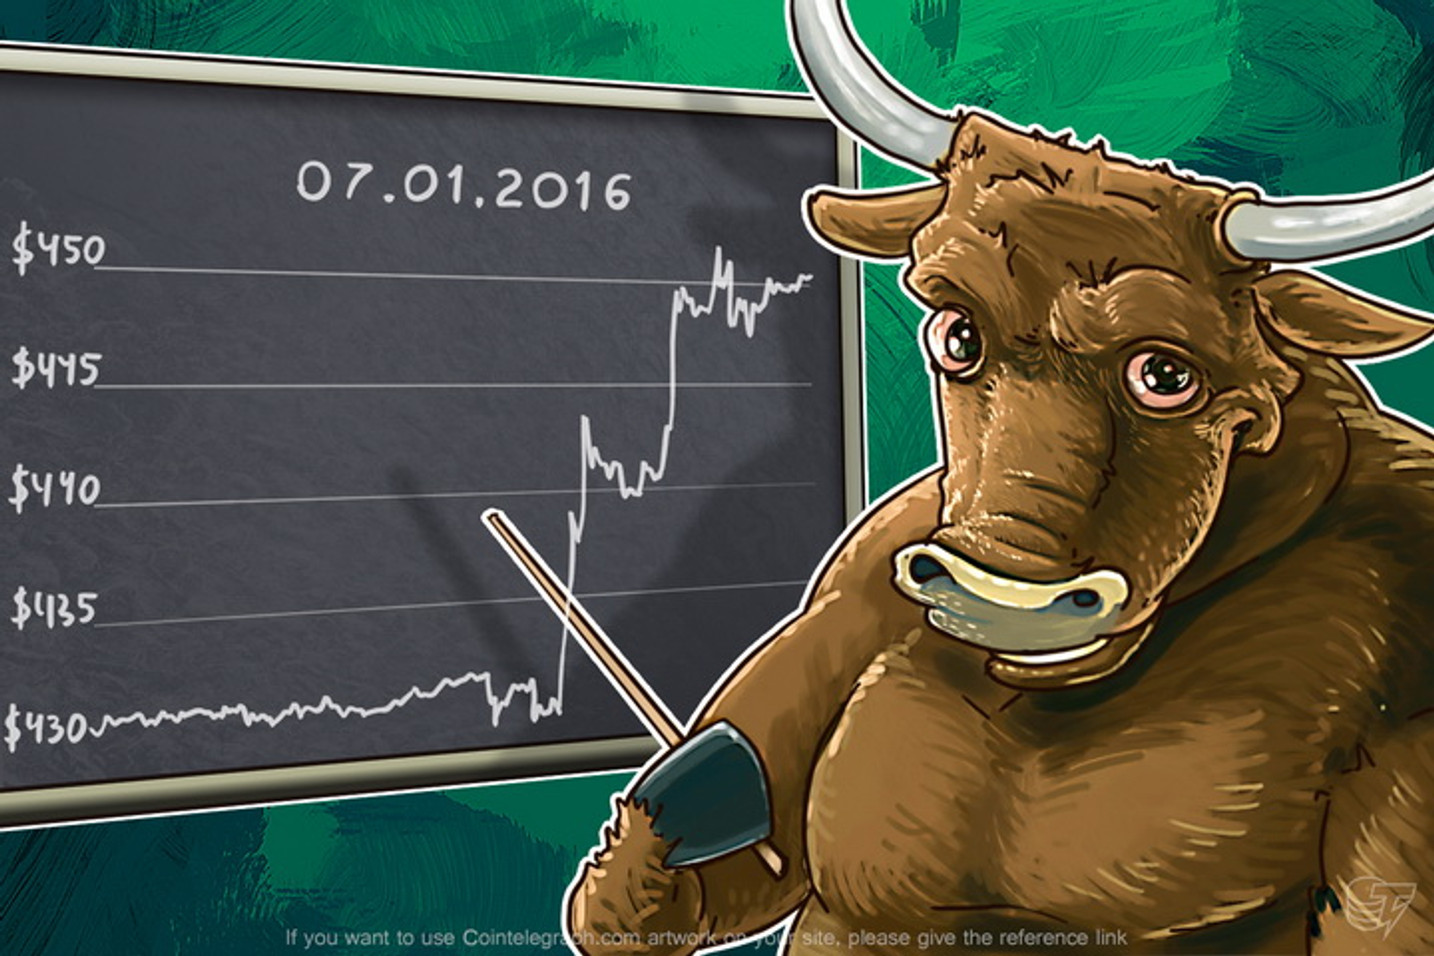 Daily Bitcoin Price Analysis: Has The Bullish Trend Resumed?